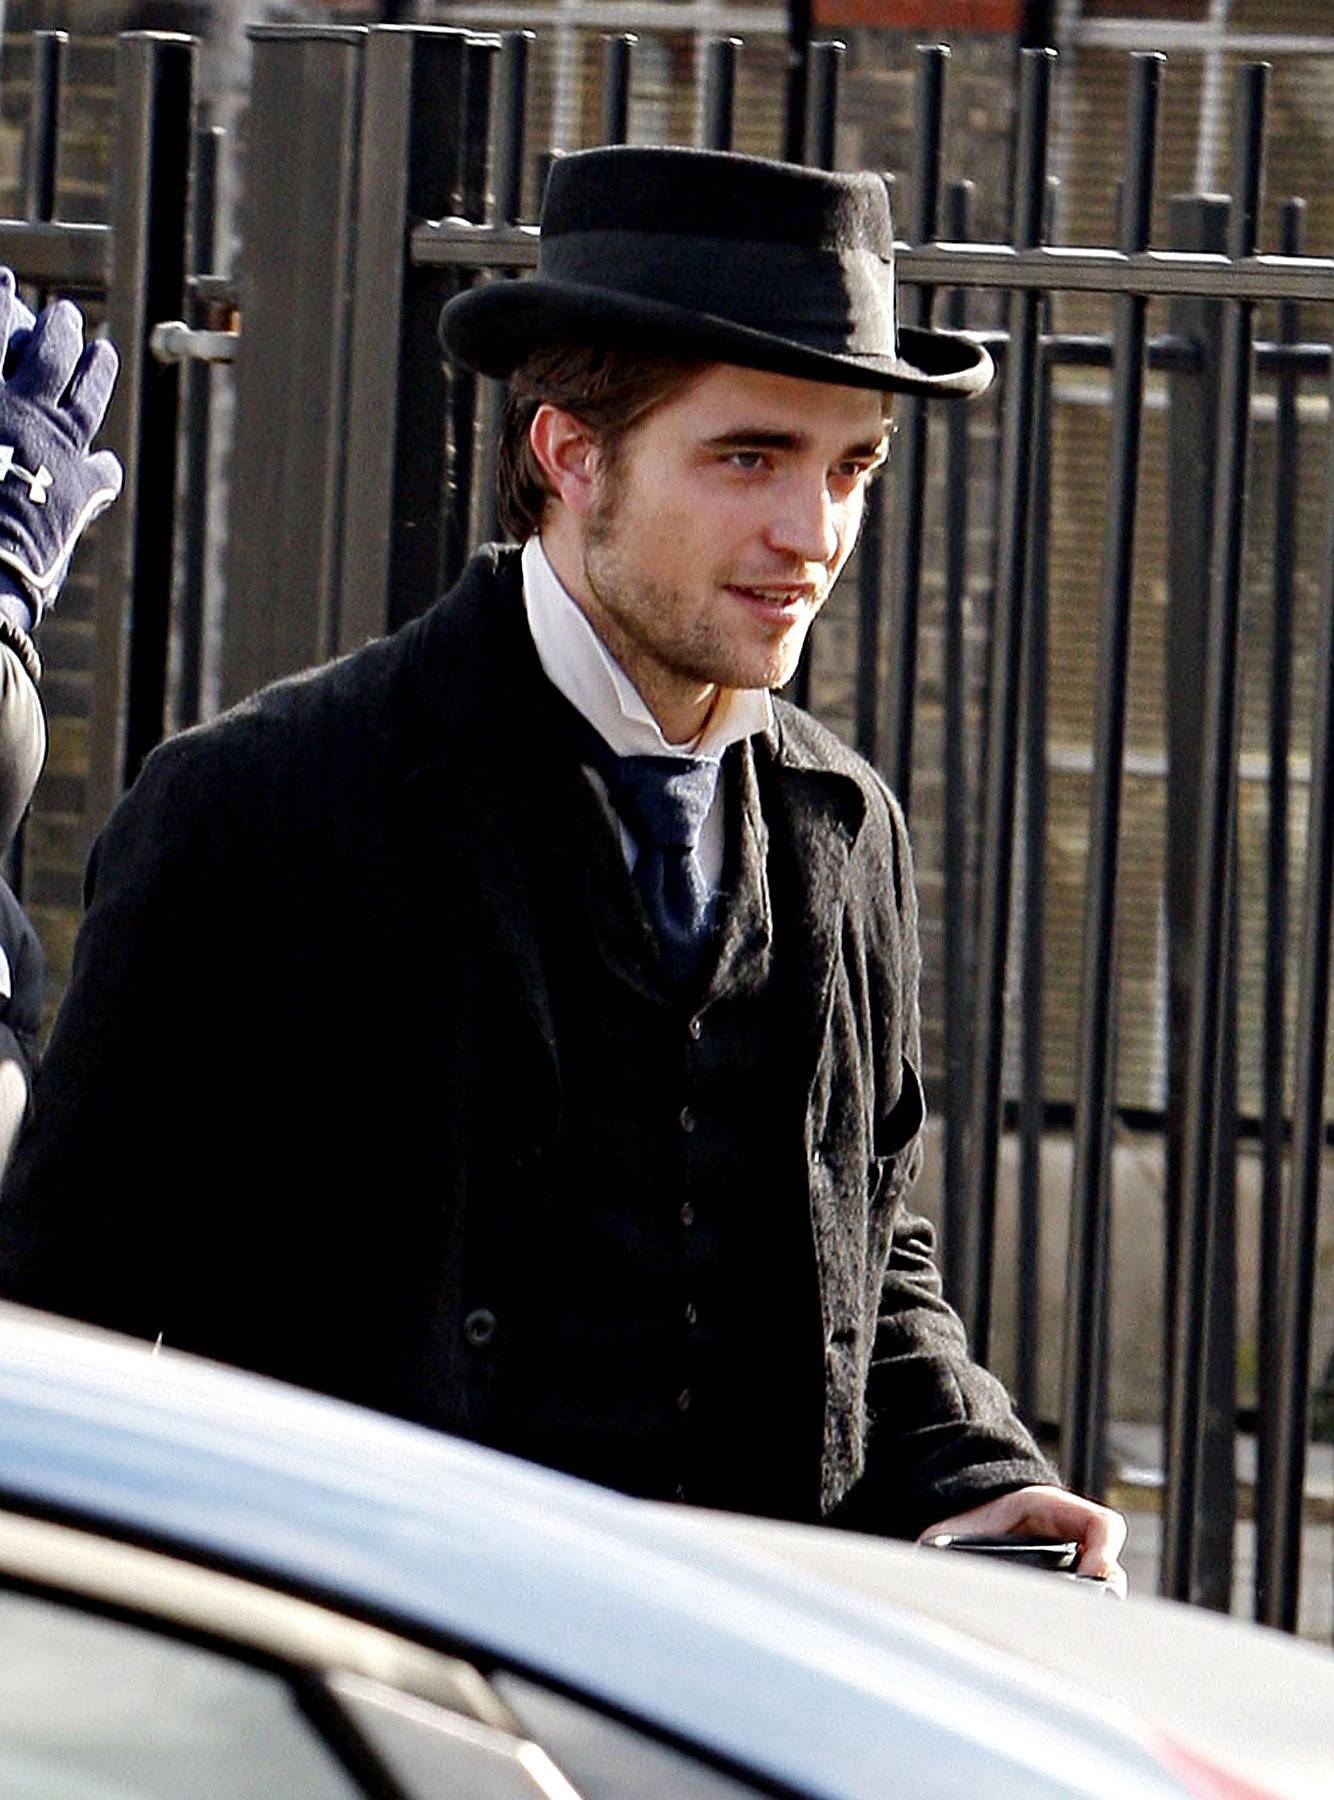 OMG First Photos of Robert Pattinson In Bel Ami! (PHOTOS)